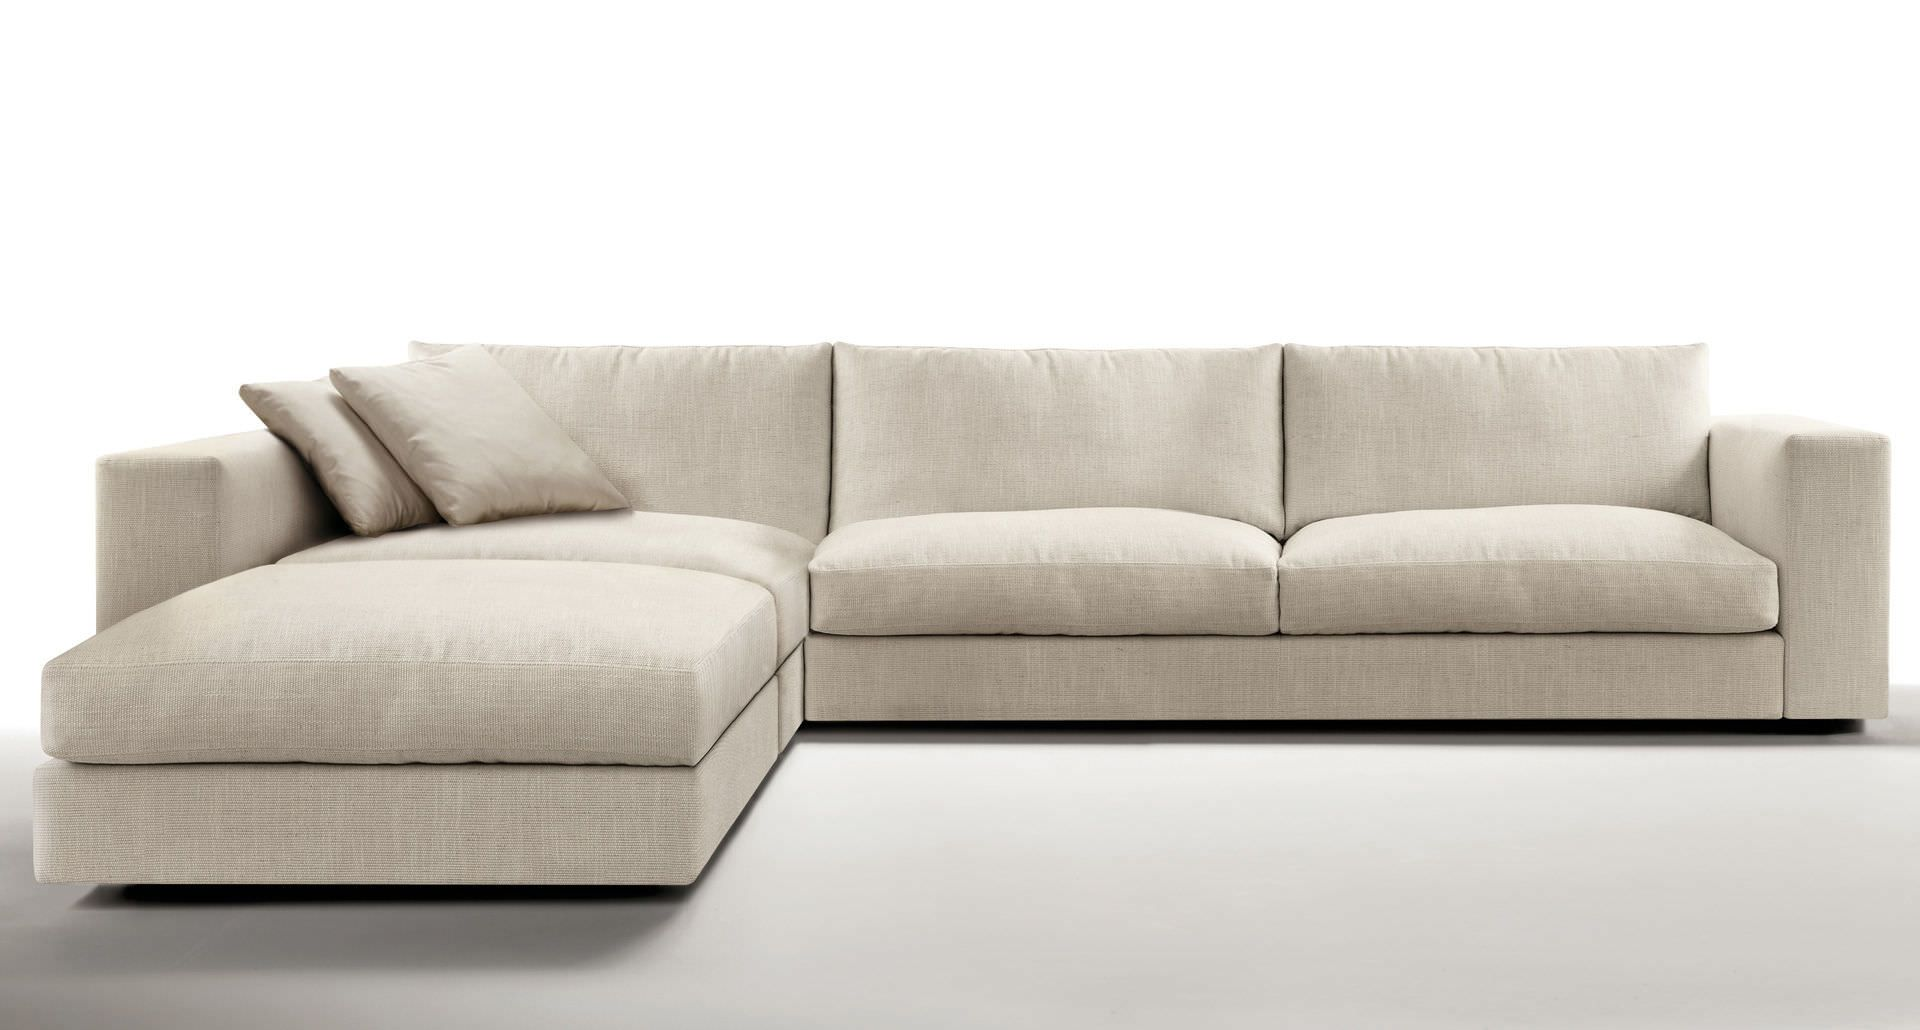 sofa manufactures outdoor covers australia corner in india manufacturers